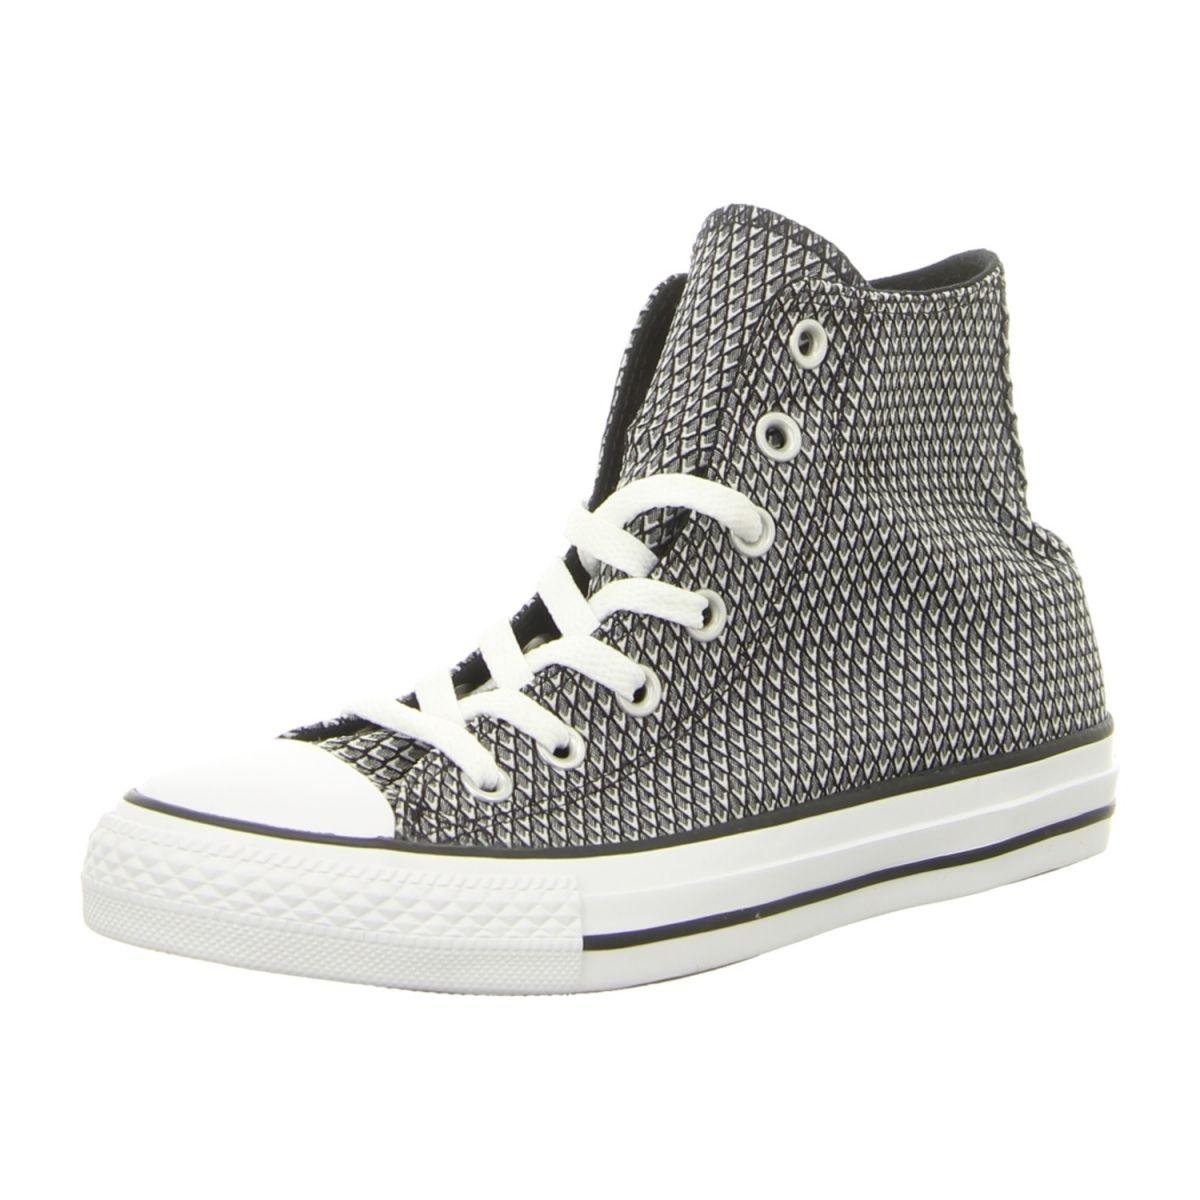 NEU: Converse Sneaker Schnürer CTASHI 555853C white